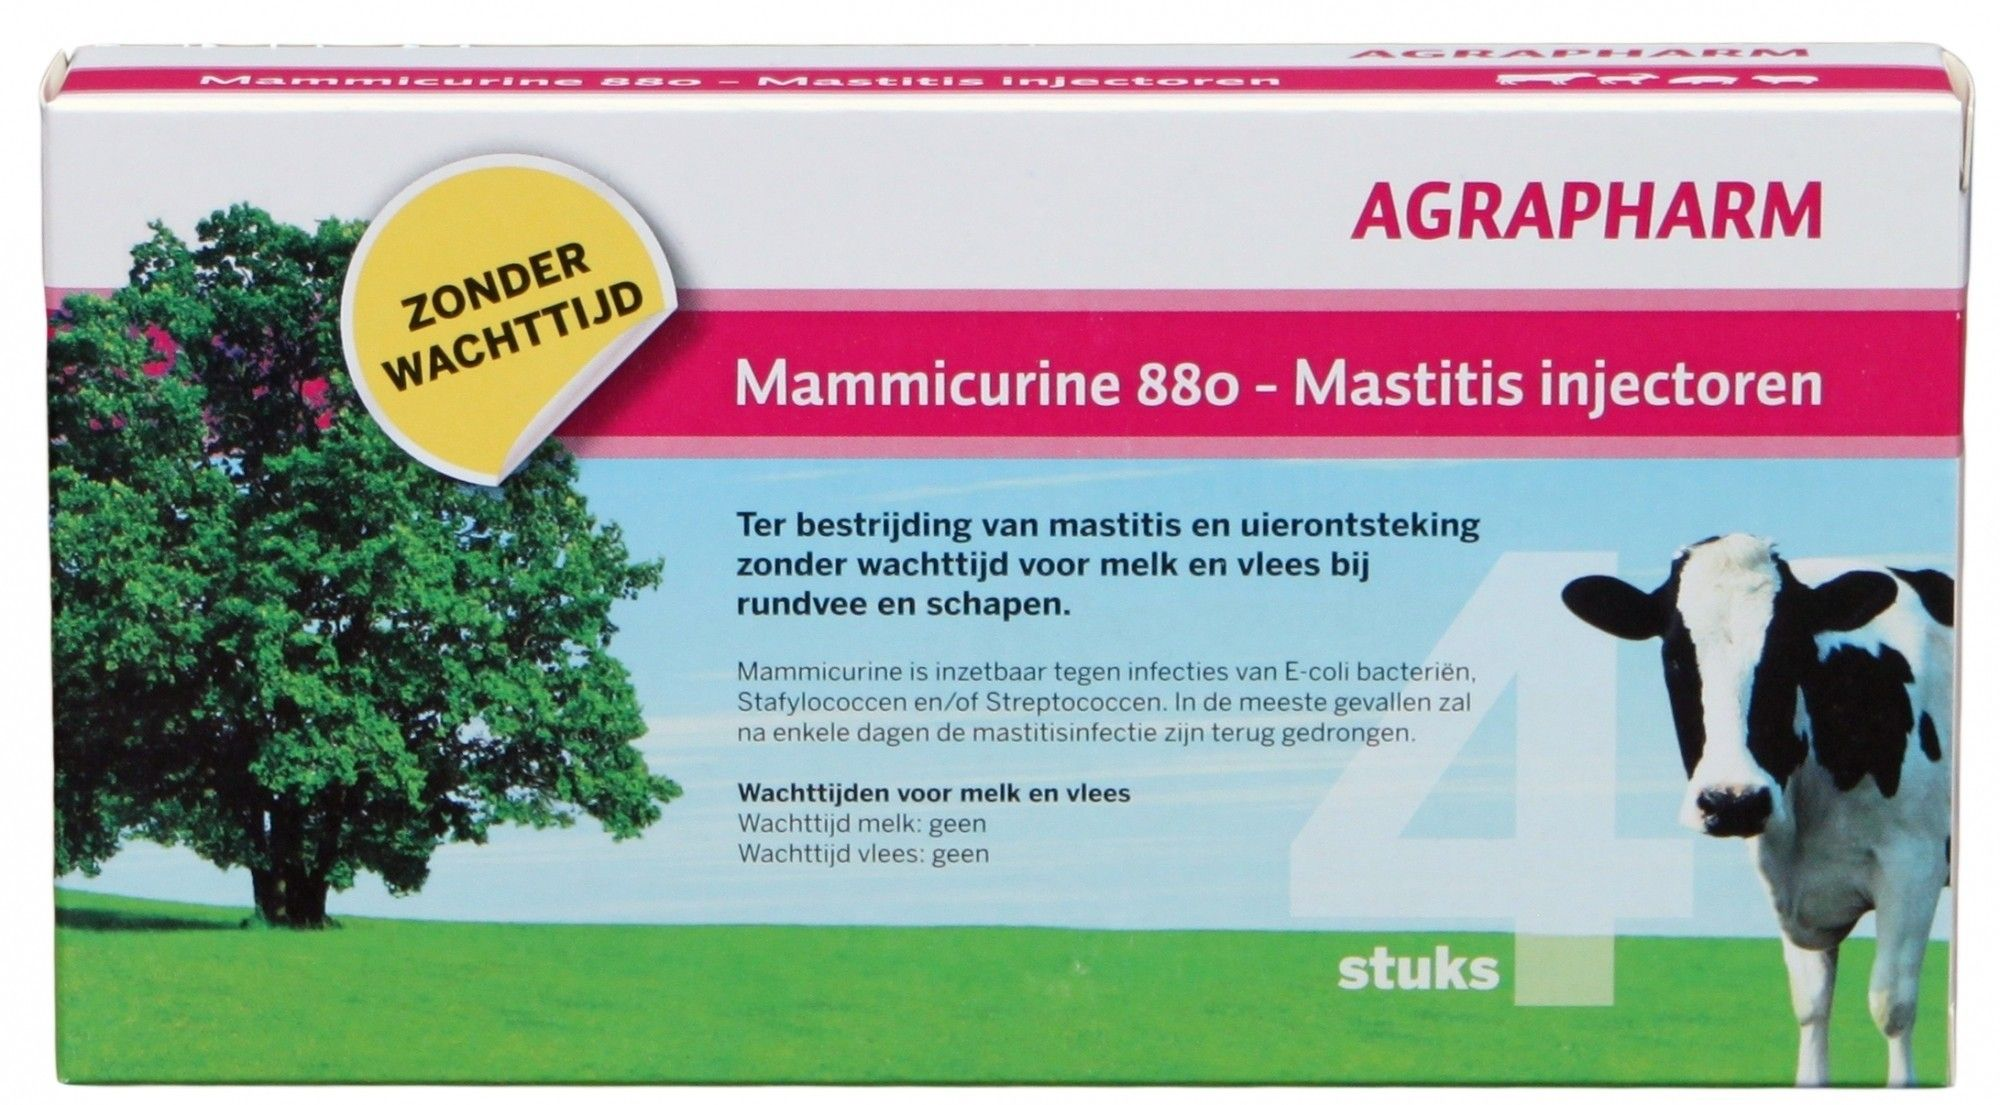 Mammicurine-880 mastitis injectoren 4 stuks